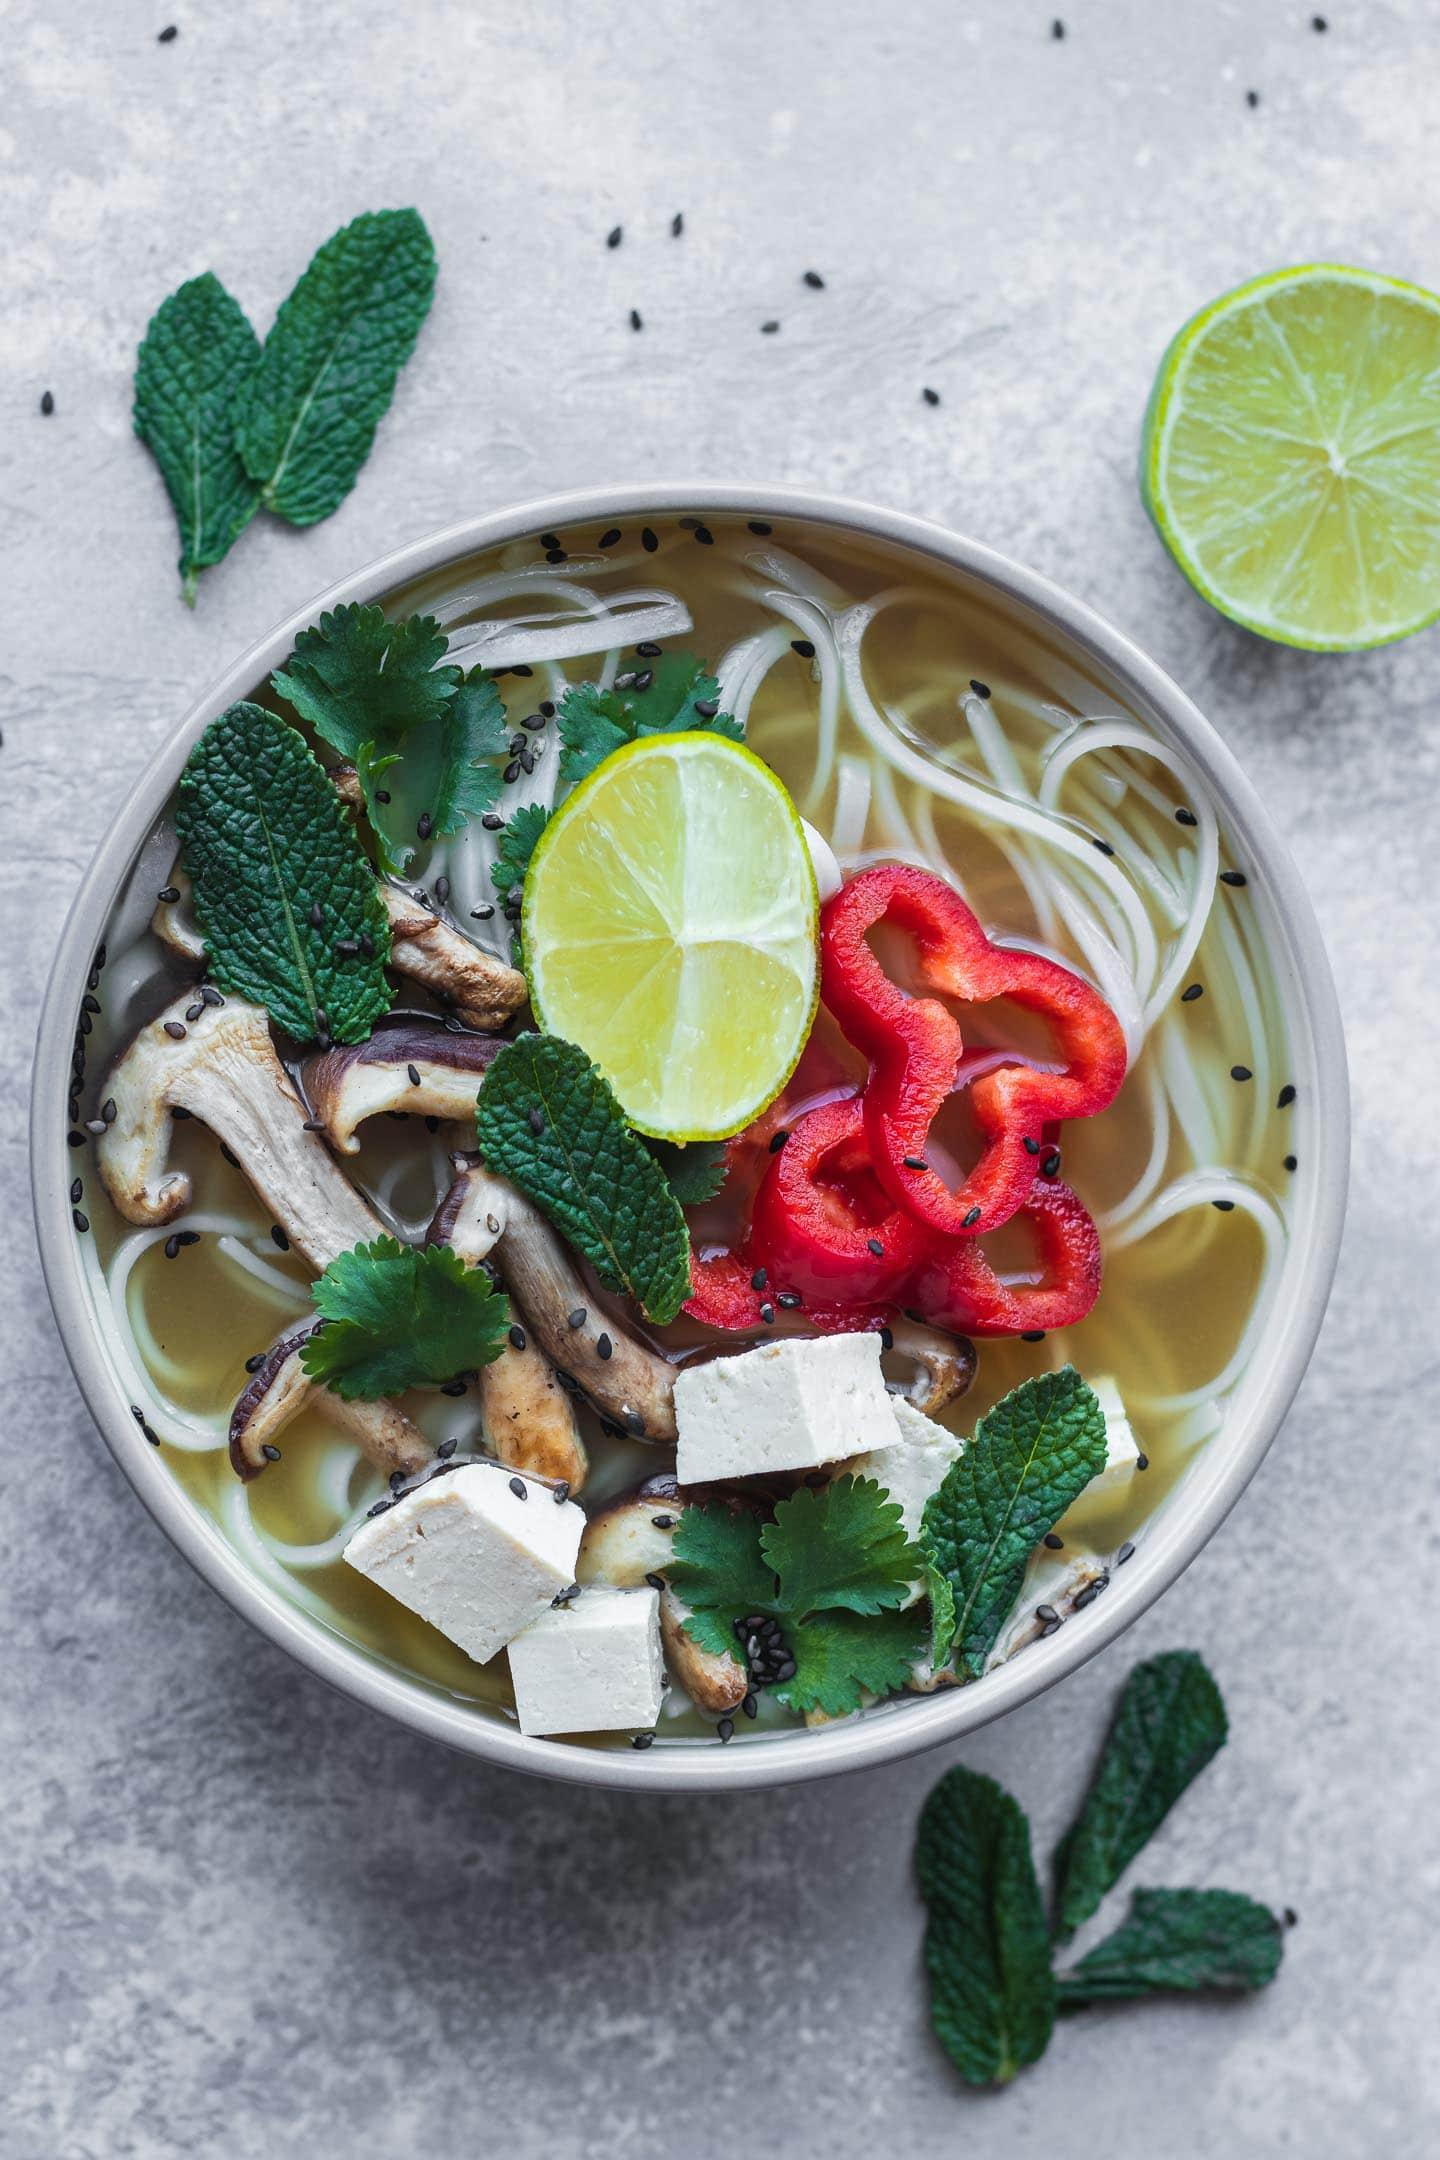 Vegan pho recipe gluten-free